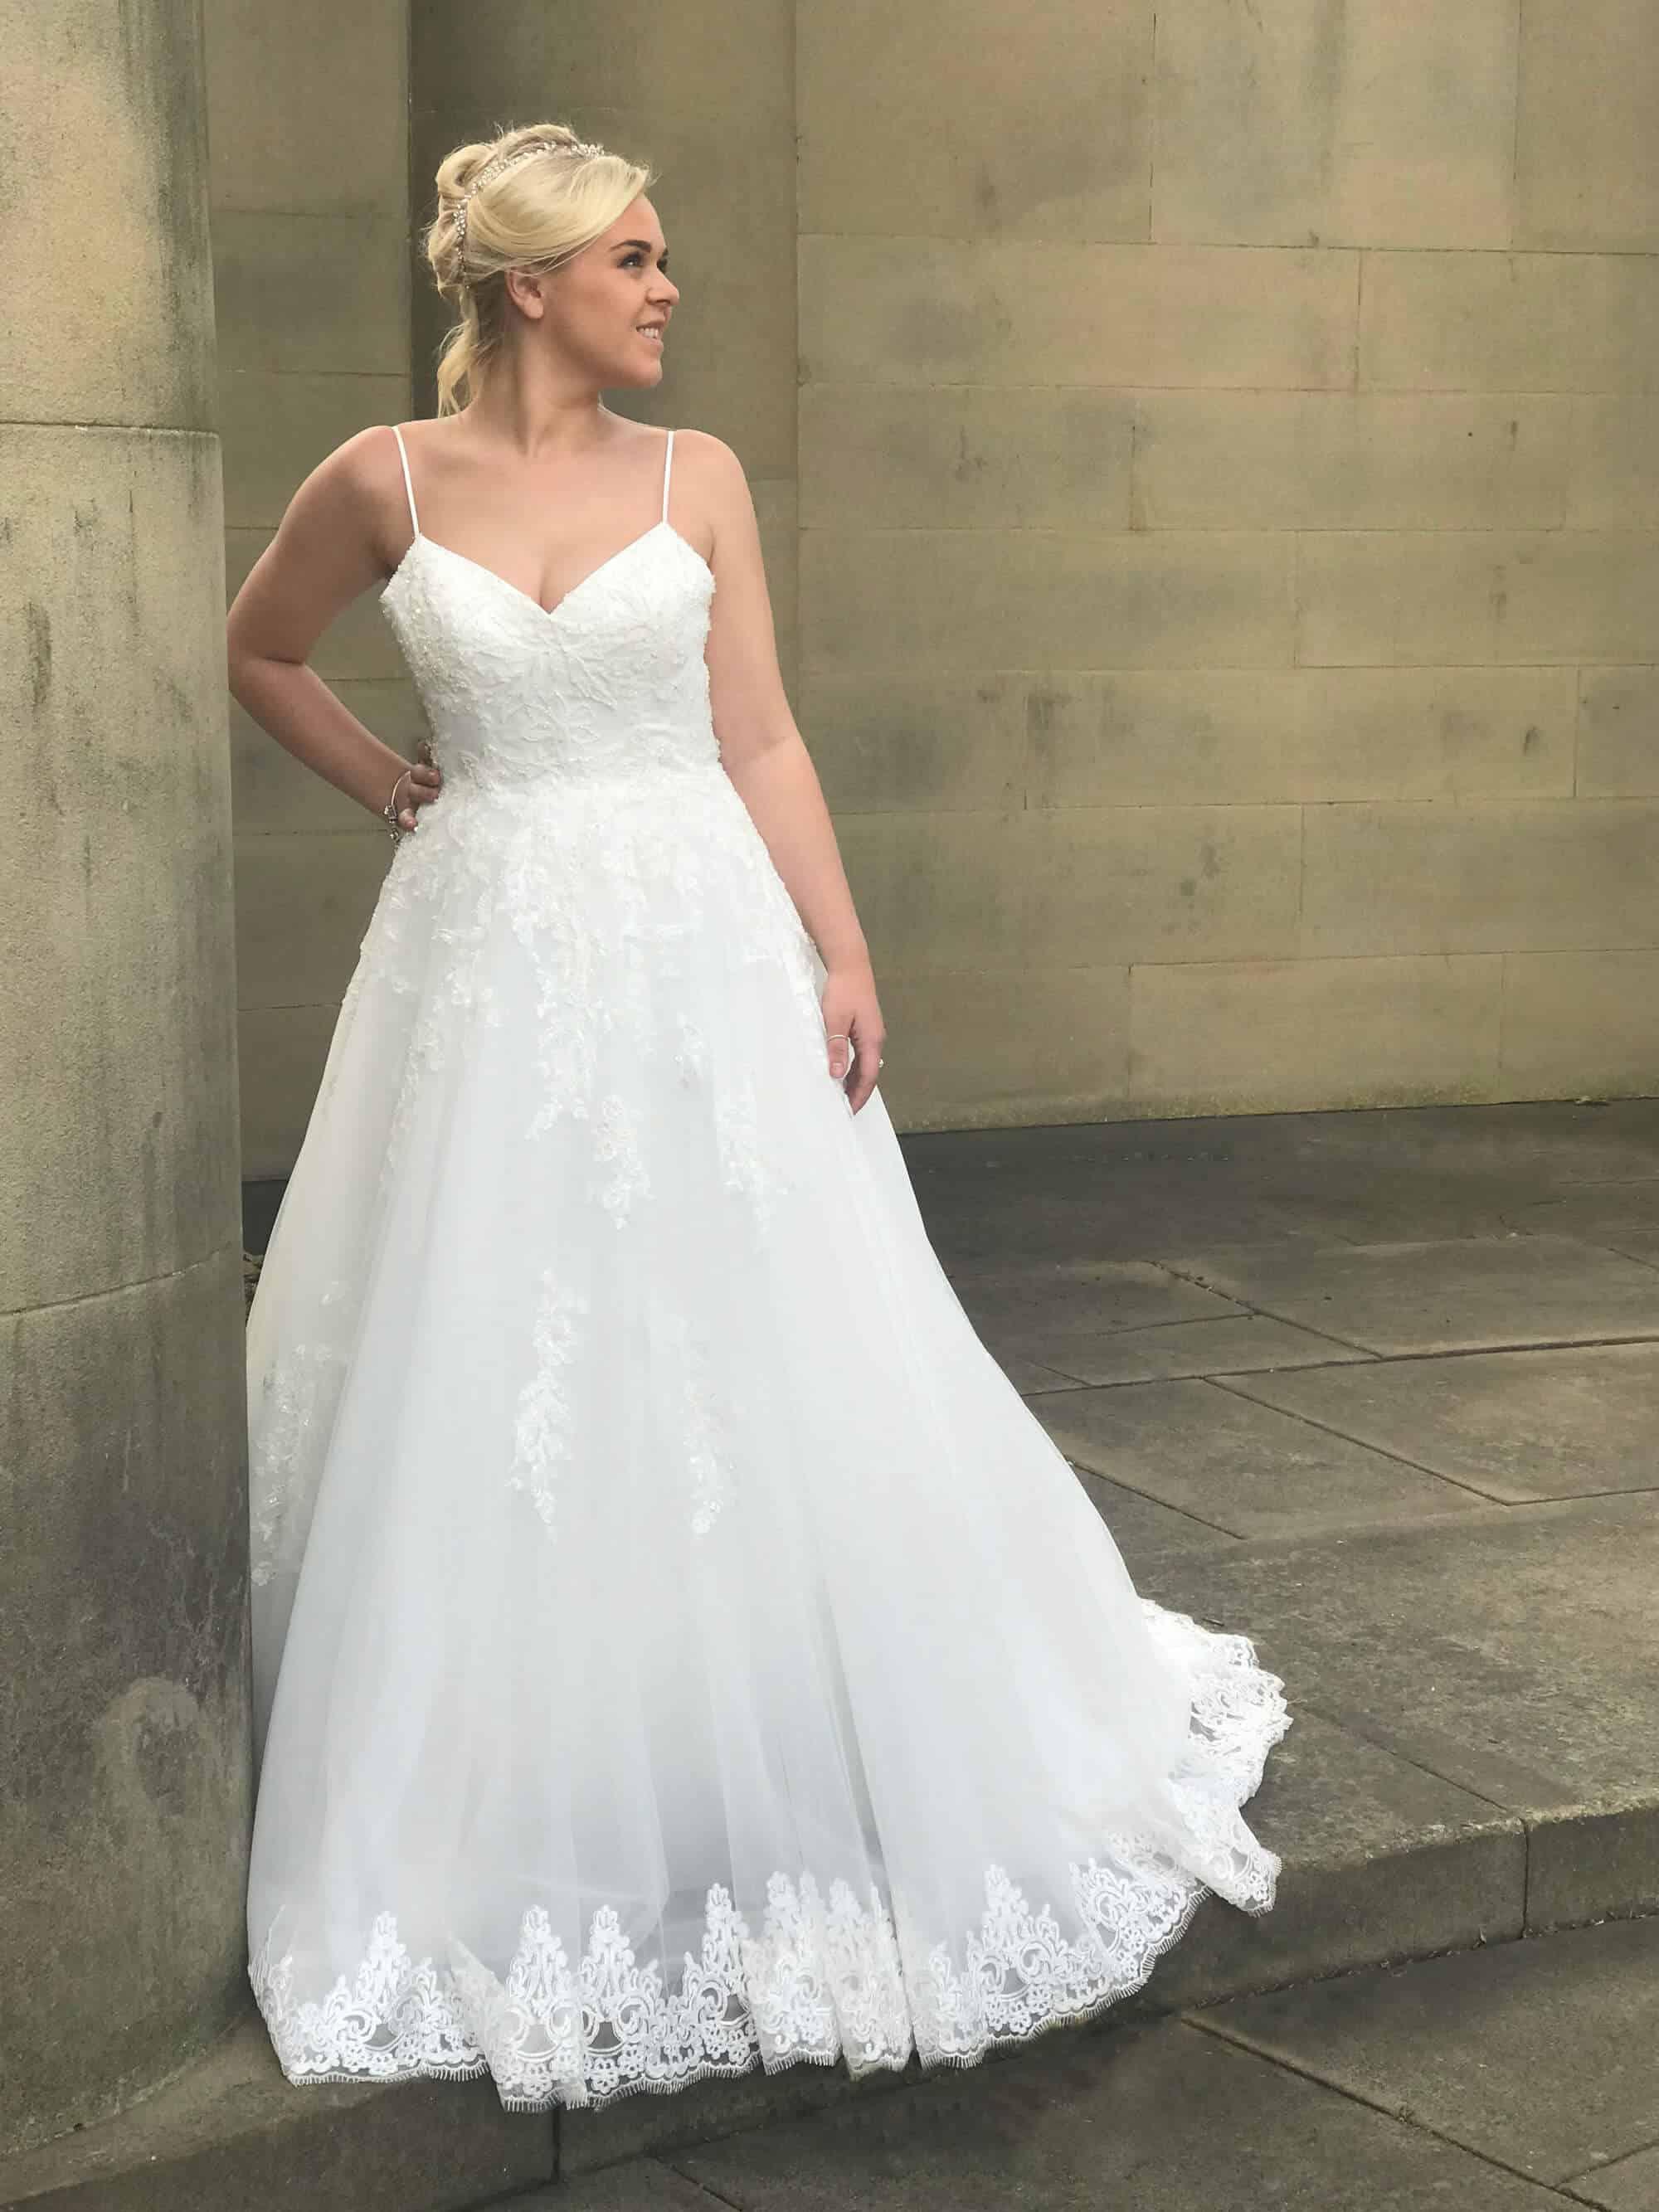 Magnolia Bridal Gown at Magnolia Bridal Designs